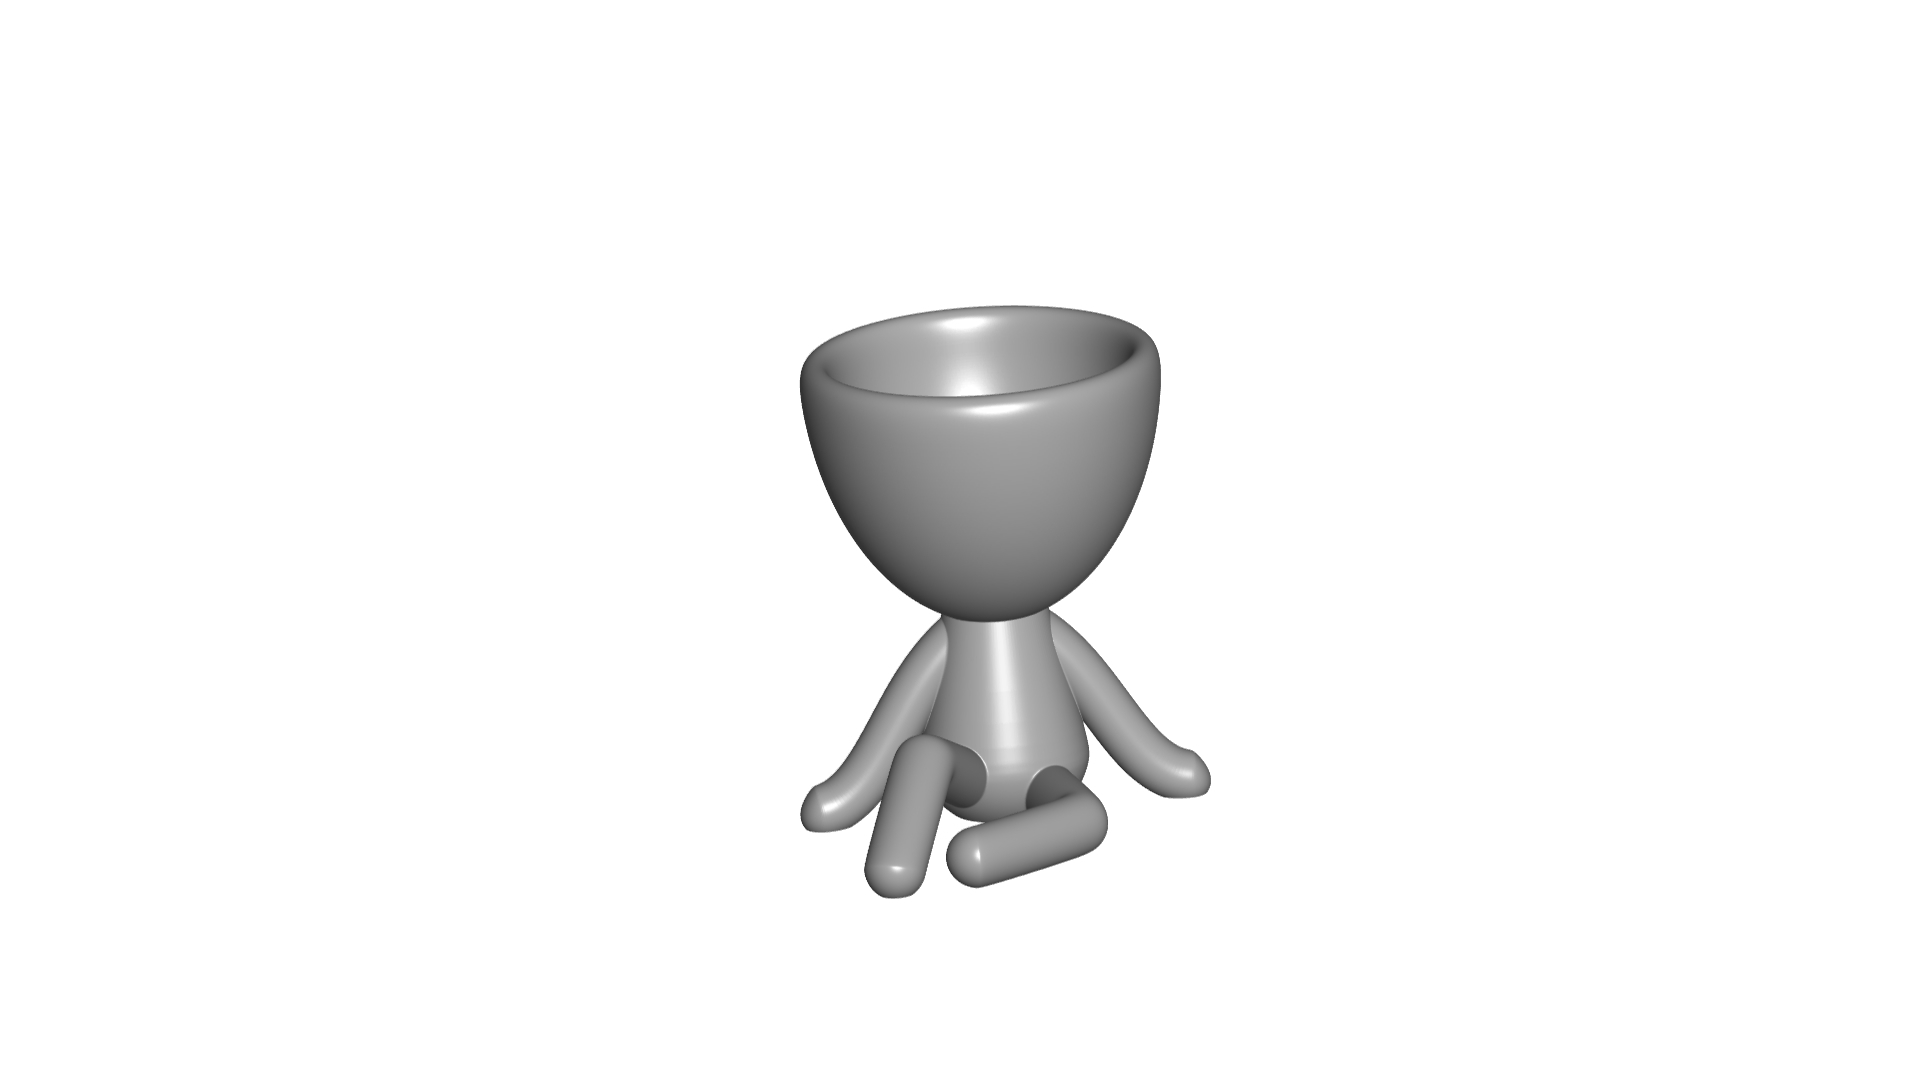 Vaso_1_Gris.jpg Download free STL file JARRÓN MACETA ROBERT 01 - VASE FLOWERPOT ROBERT 01 • 3D printable object, PRODUSTL56